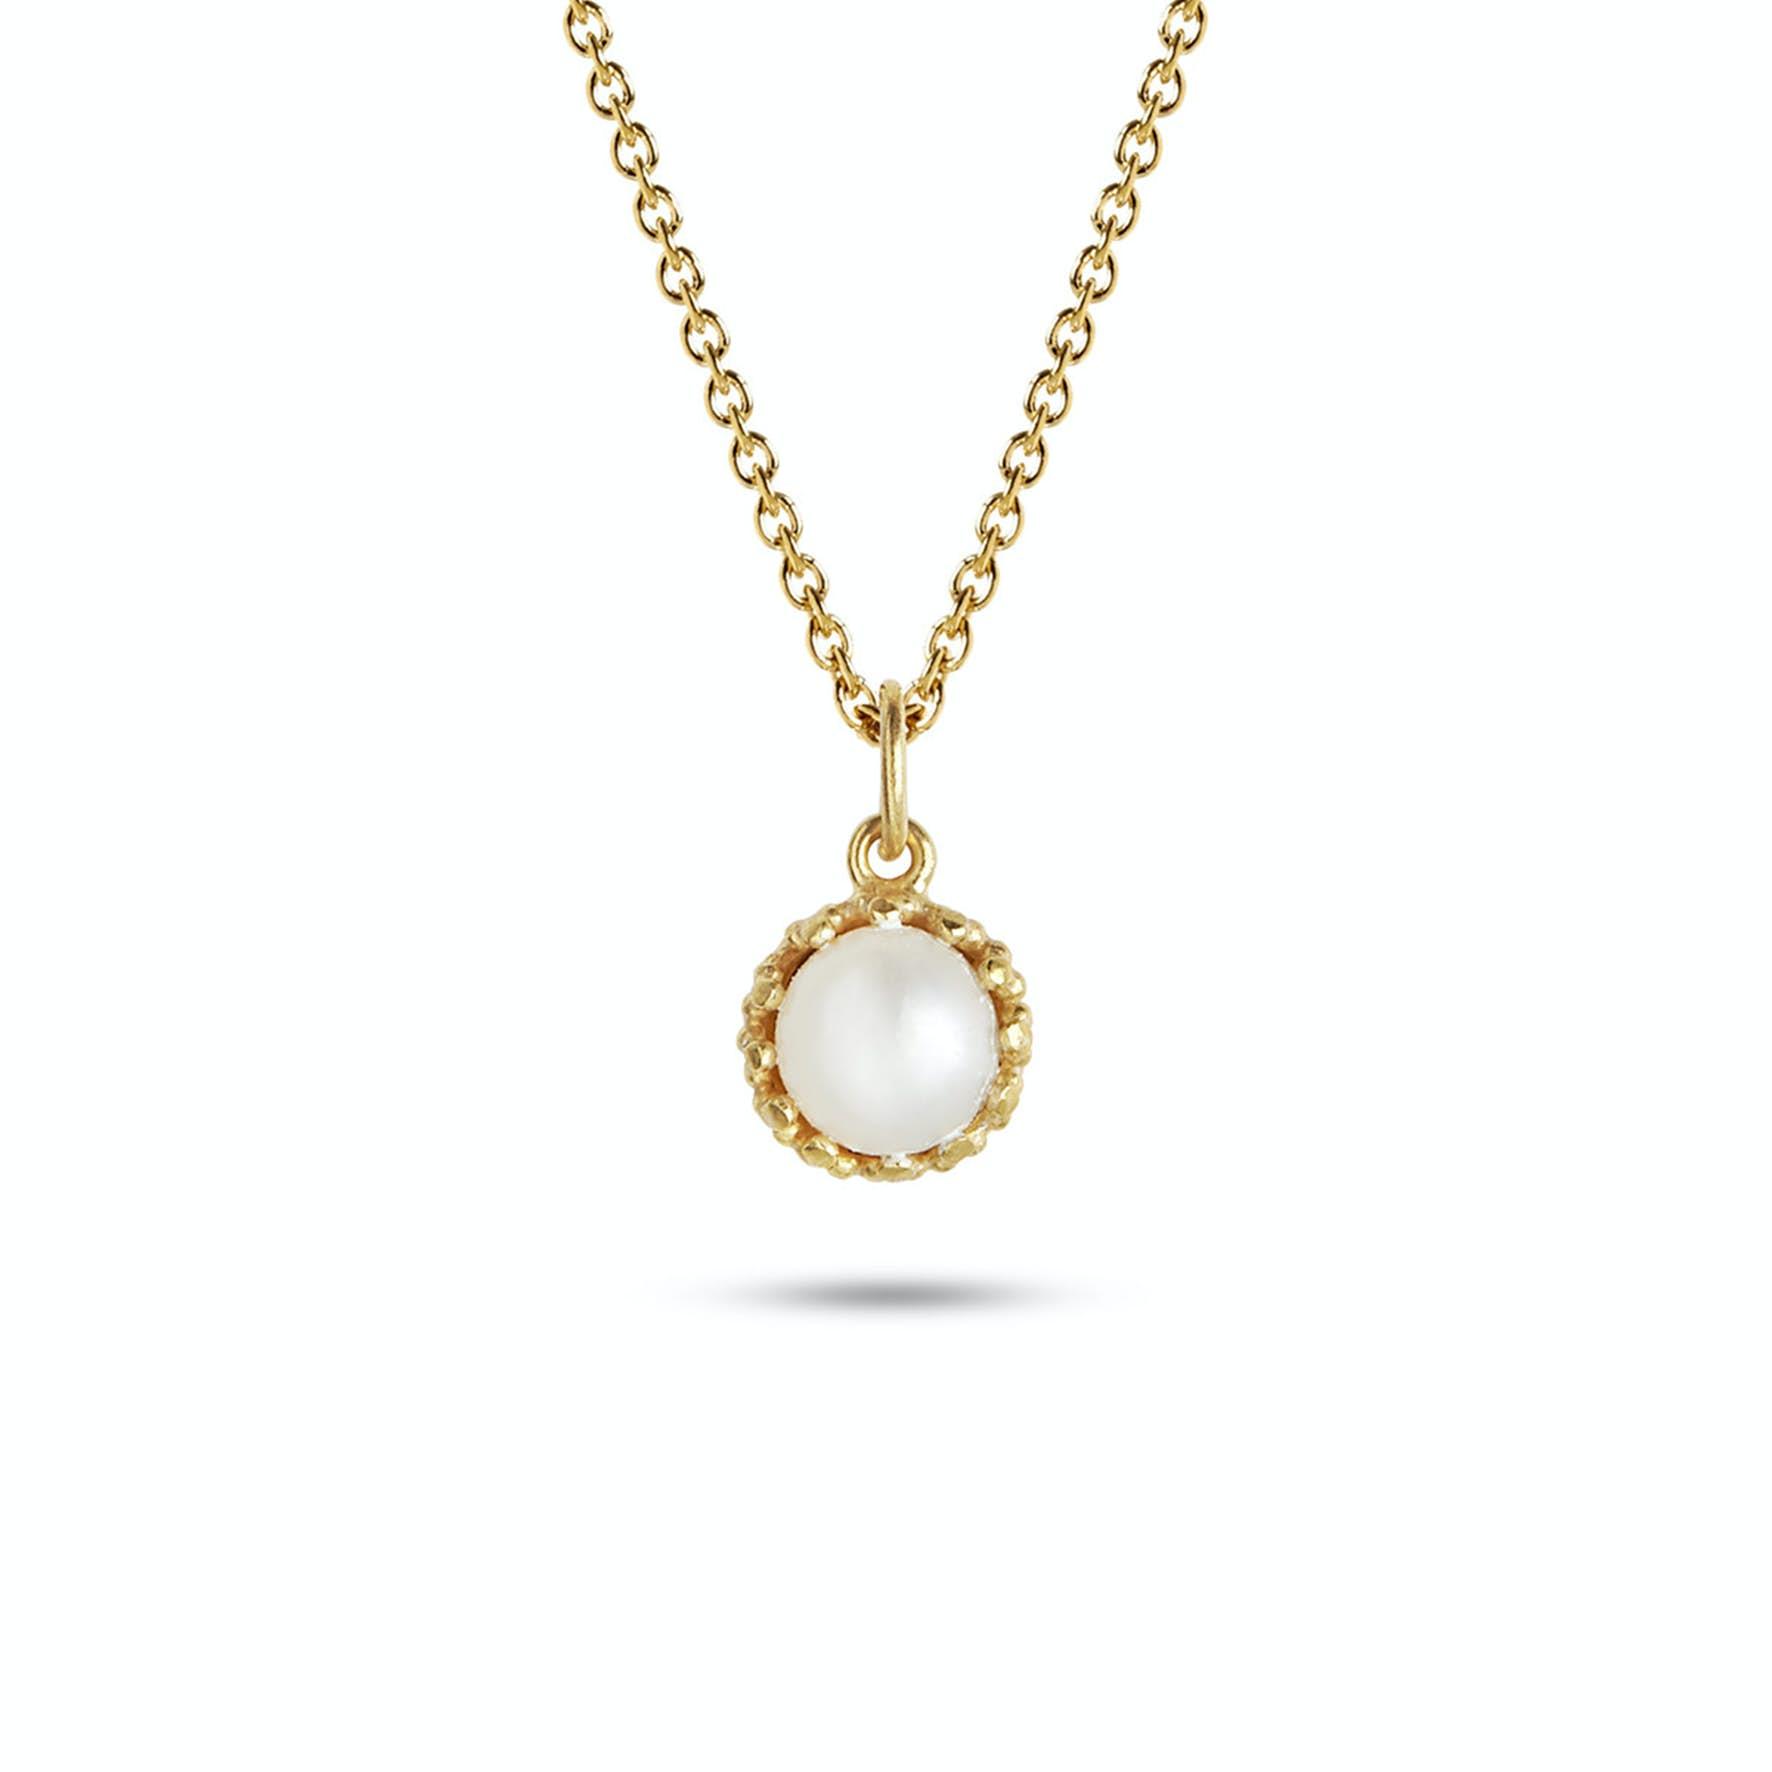 Gilded Marvels Pendant Pearl fra Carré i Forgyldt-Sølv Sterling 925|Freshwater Pearl